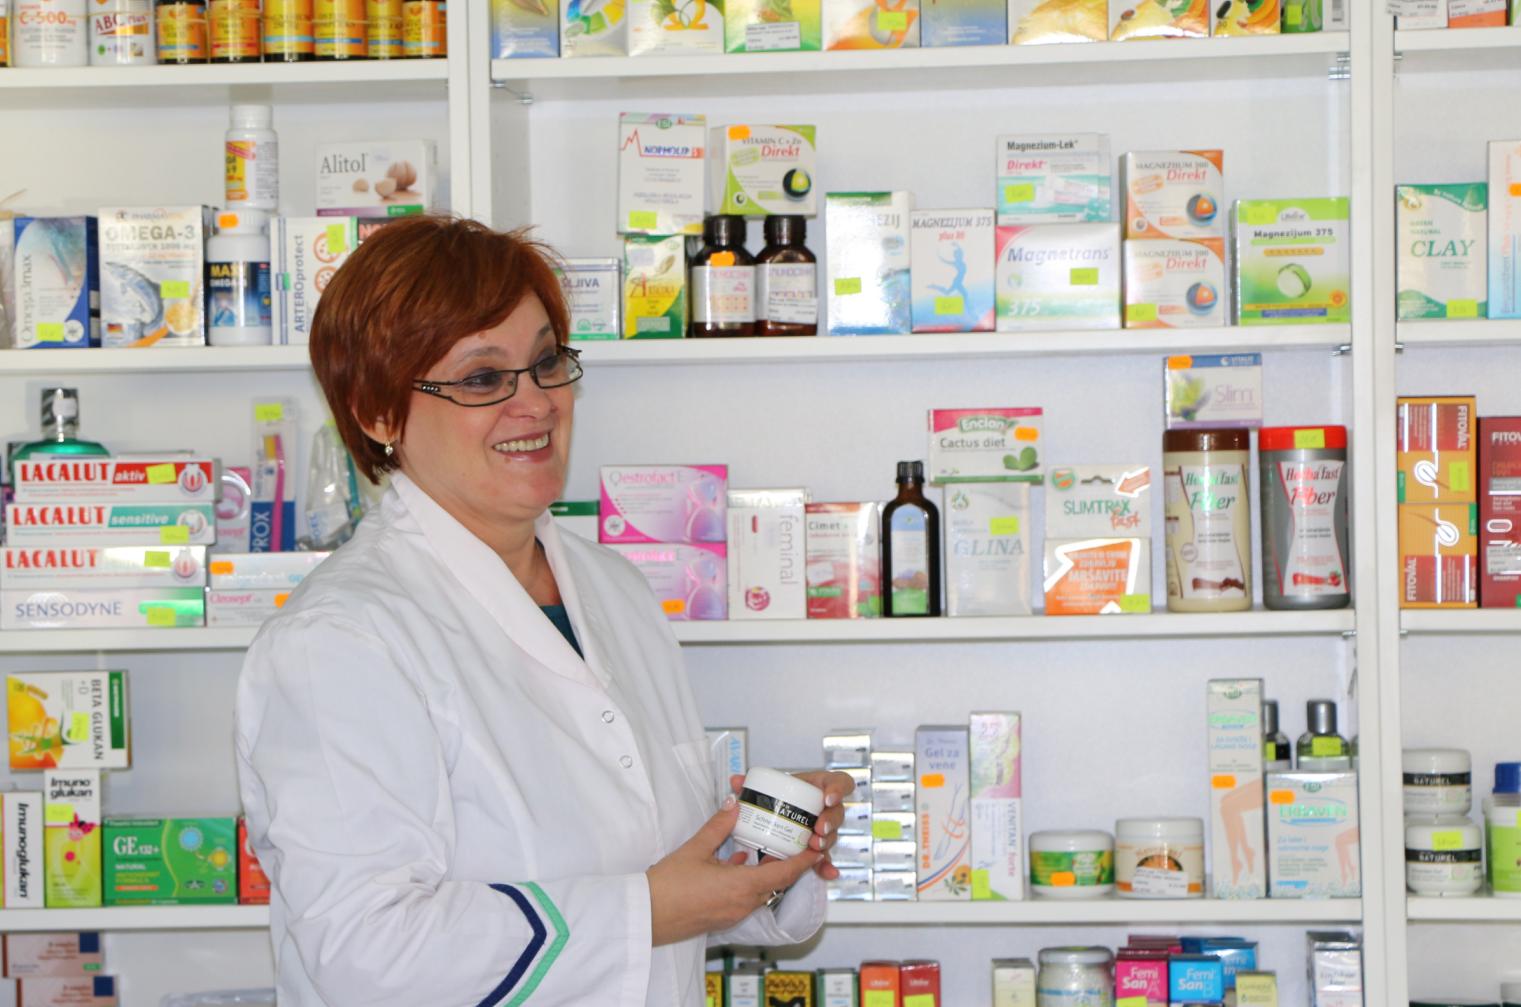 pharmacist2